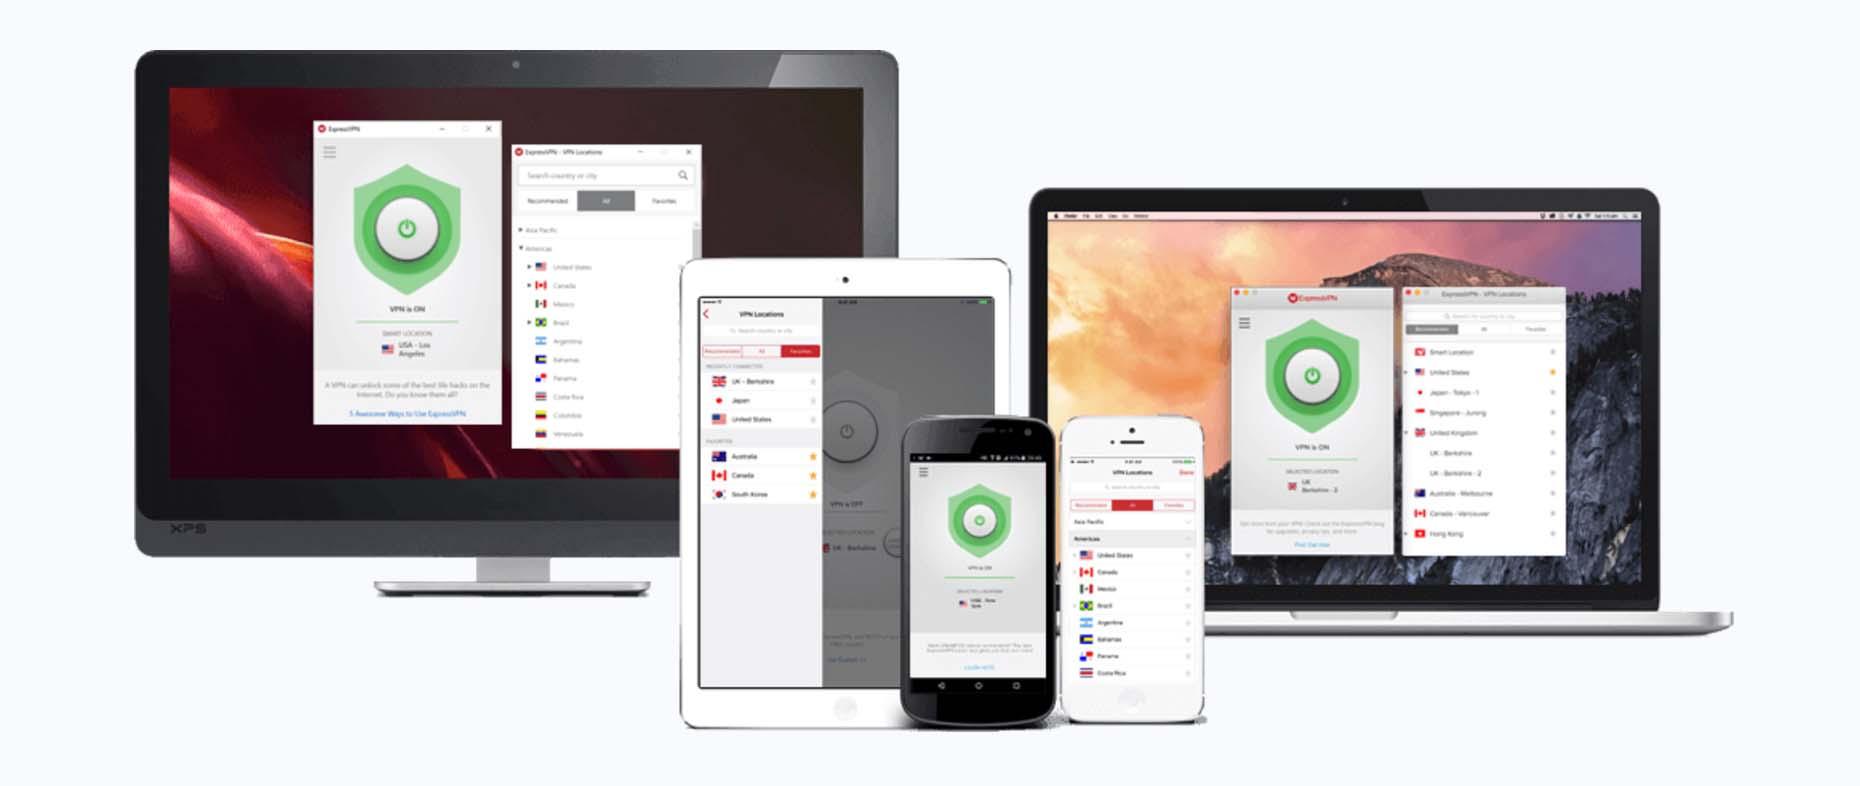 Servidor online con Express VPN